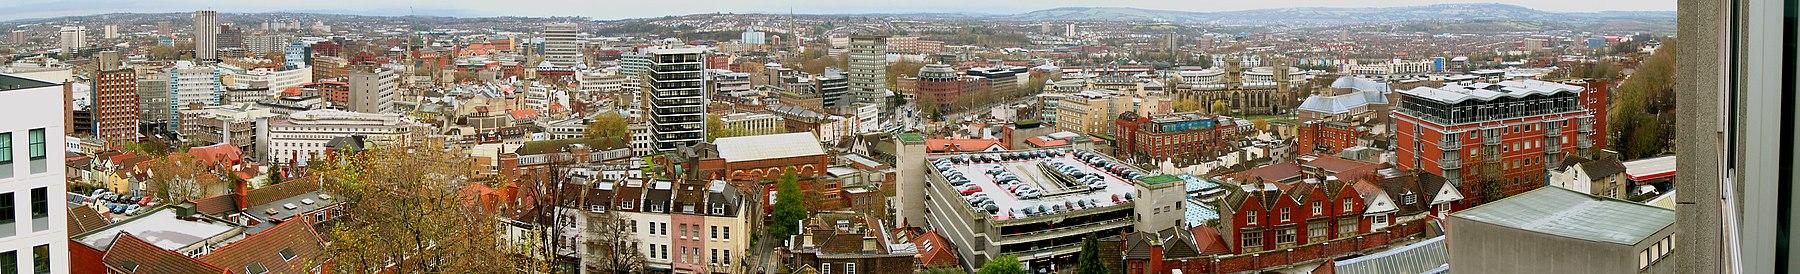 Panorama over Bristol